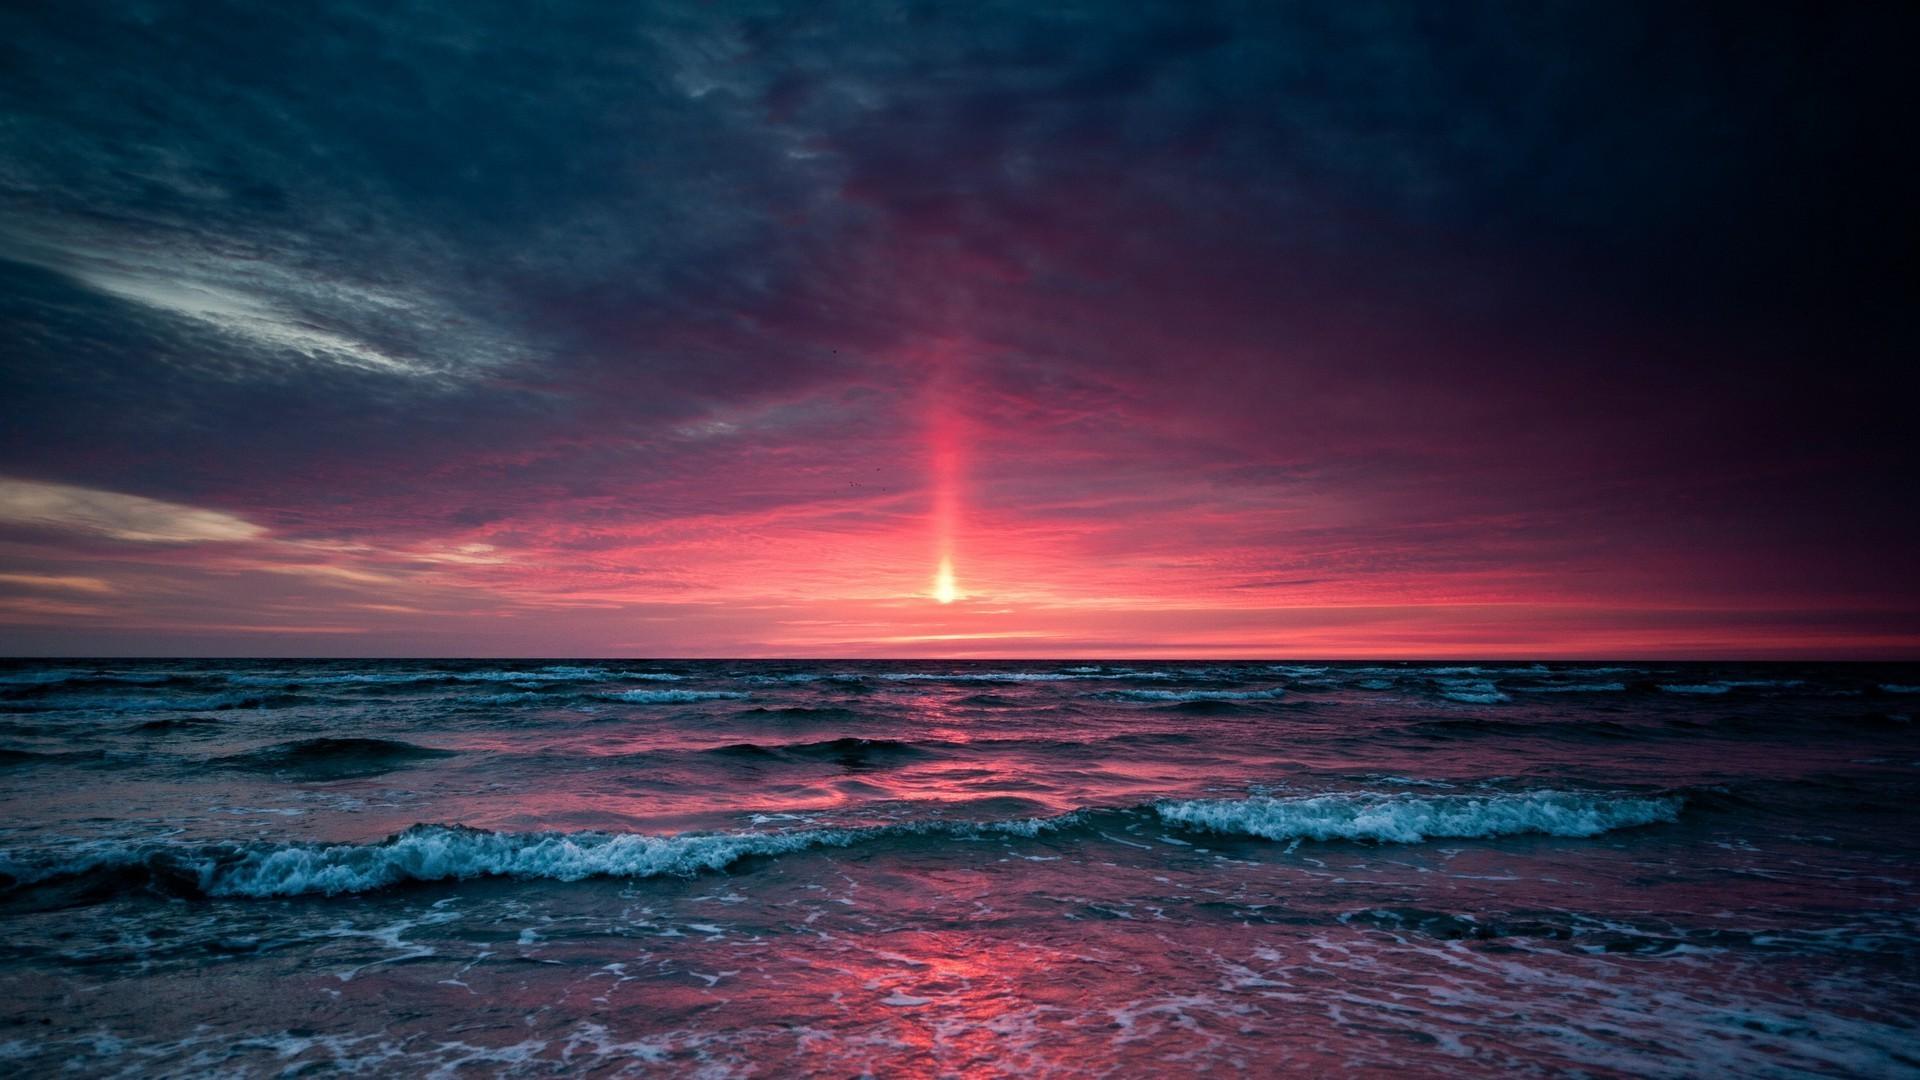 Red sunrise Beach HD desktop wallpaper, Sky wallpaper, Sunrise wallpaper, Ocean  wallpaper – Beaches no.